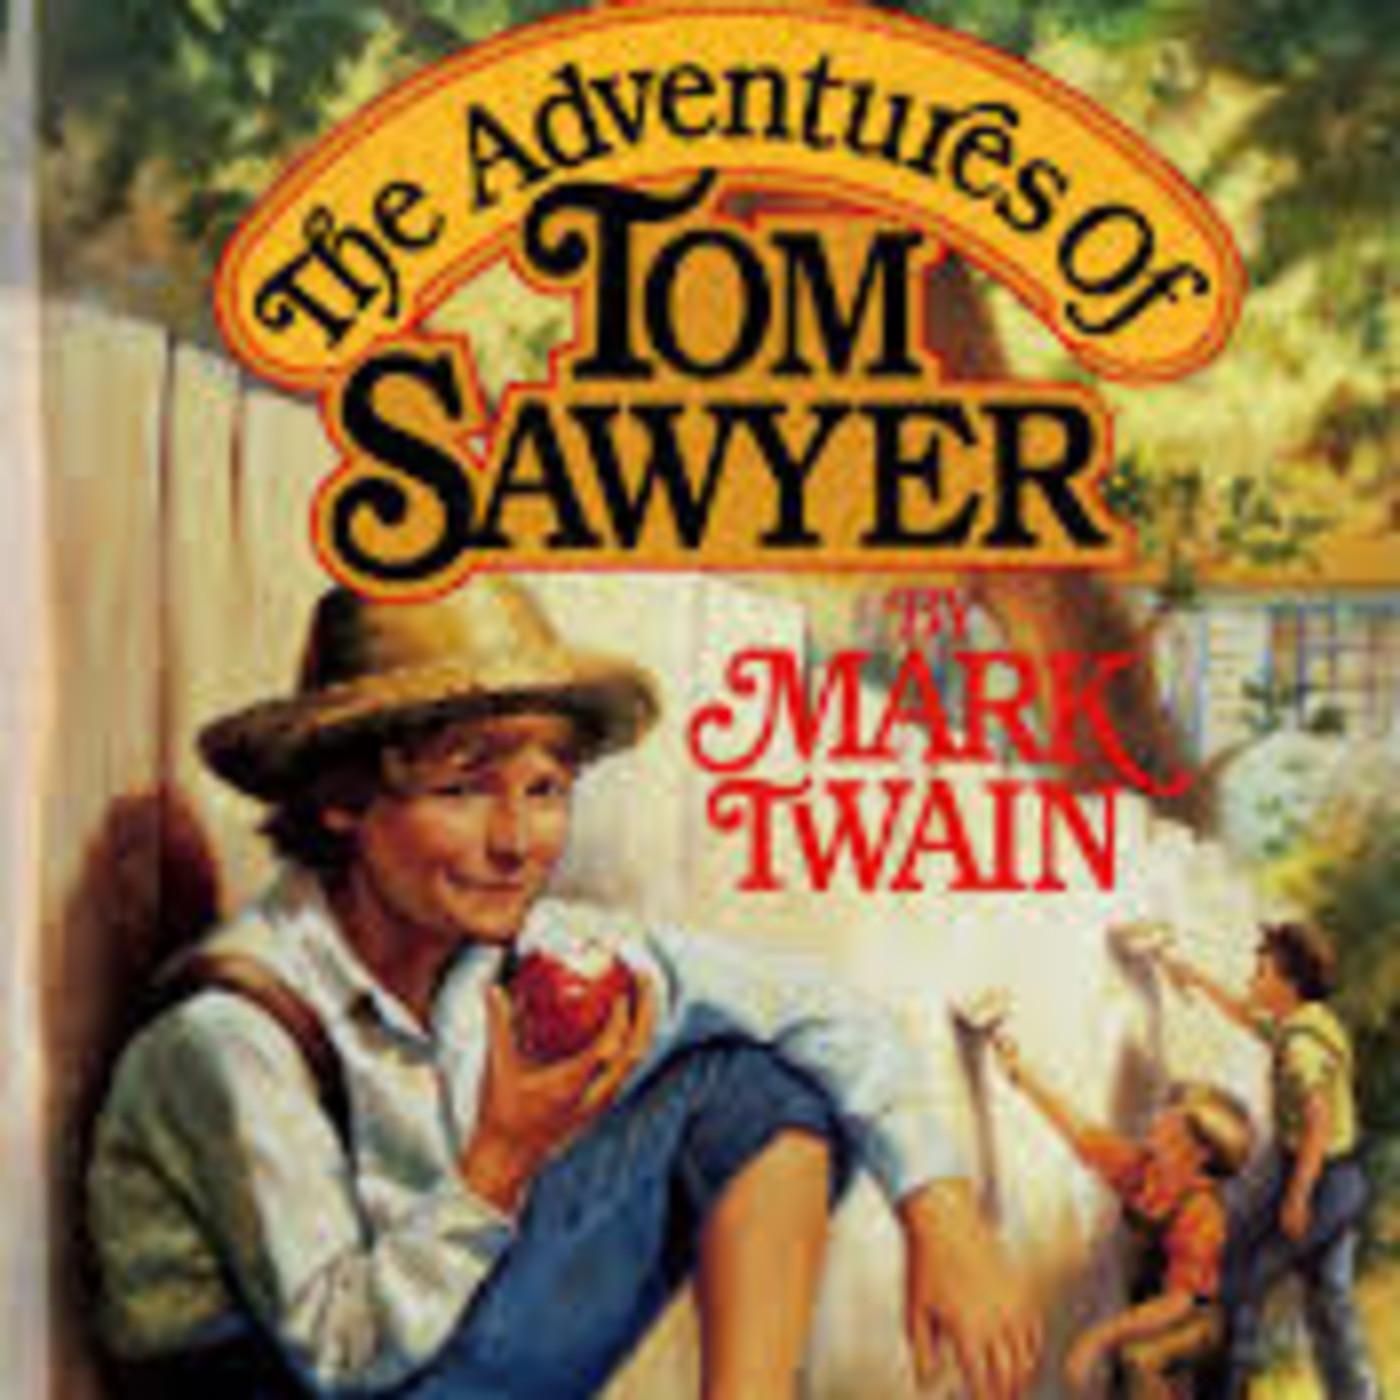 la tom sawyer Tom sawyer's bar & grill, la crosse: see 57 unbiased reviews of tom sawyer's bar & grill, rated 4 of 5 on tripadvisor and ranked #40 of 204 restaurants in la.